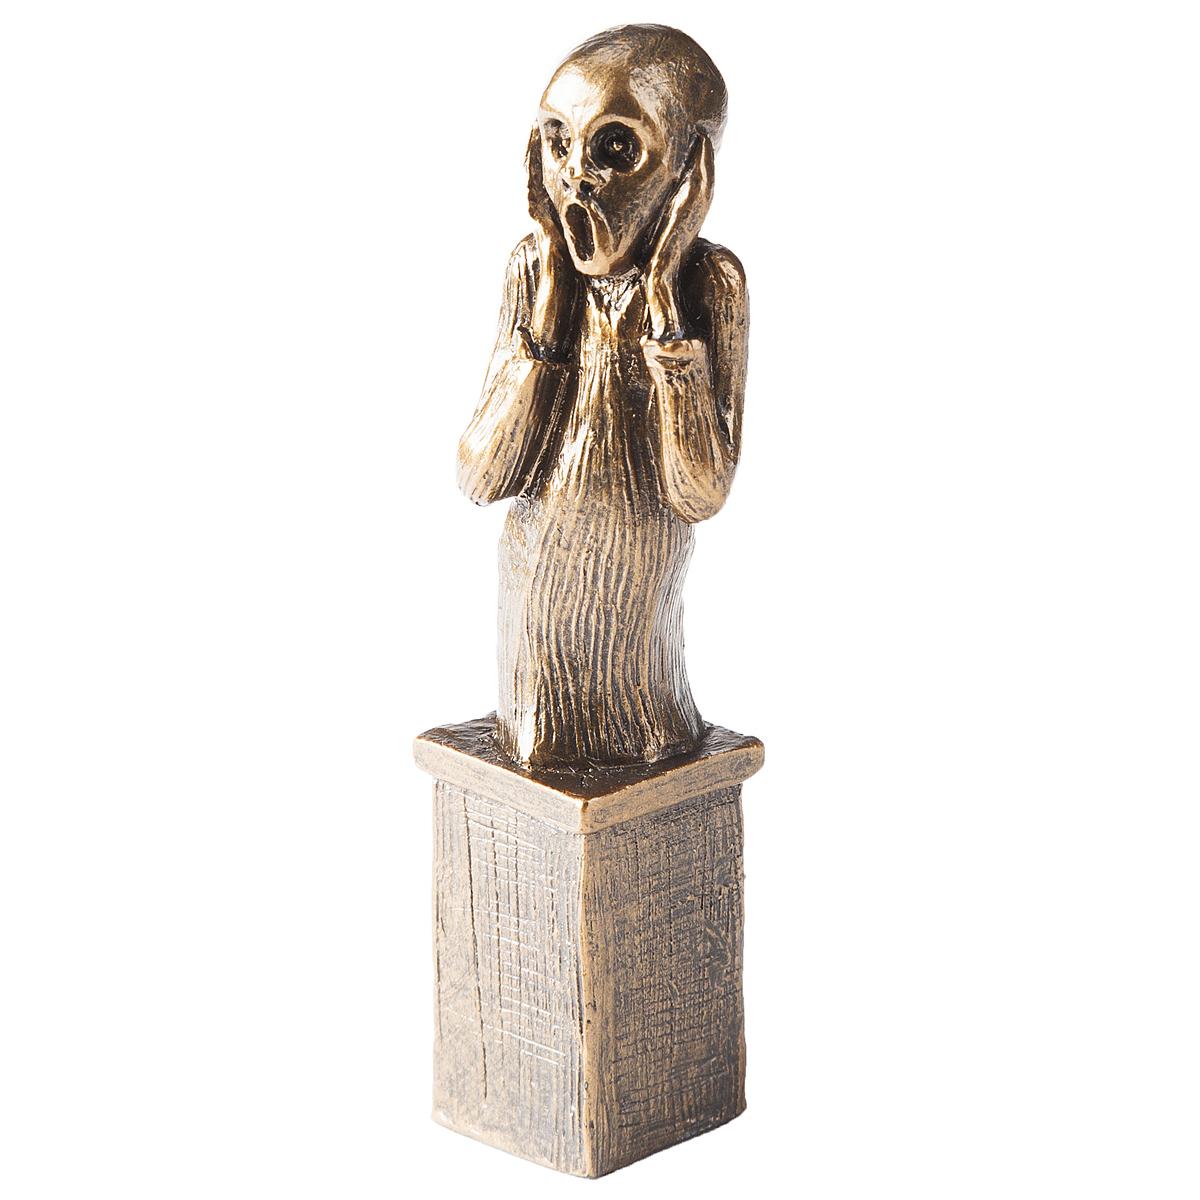 Scream ornament